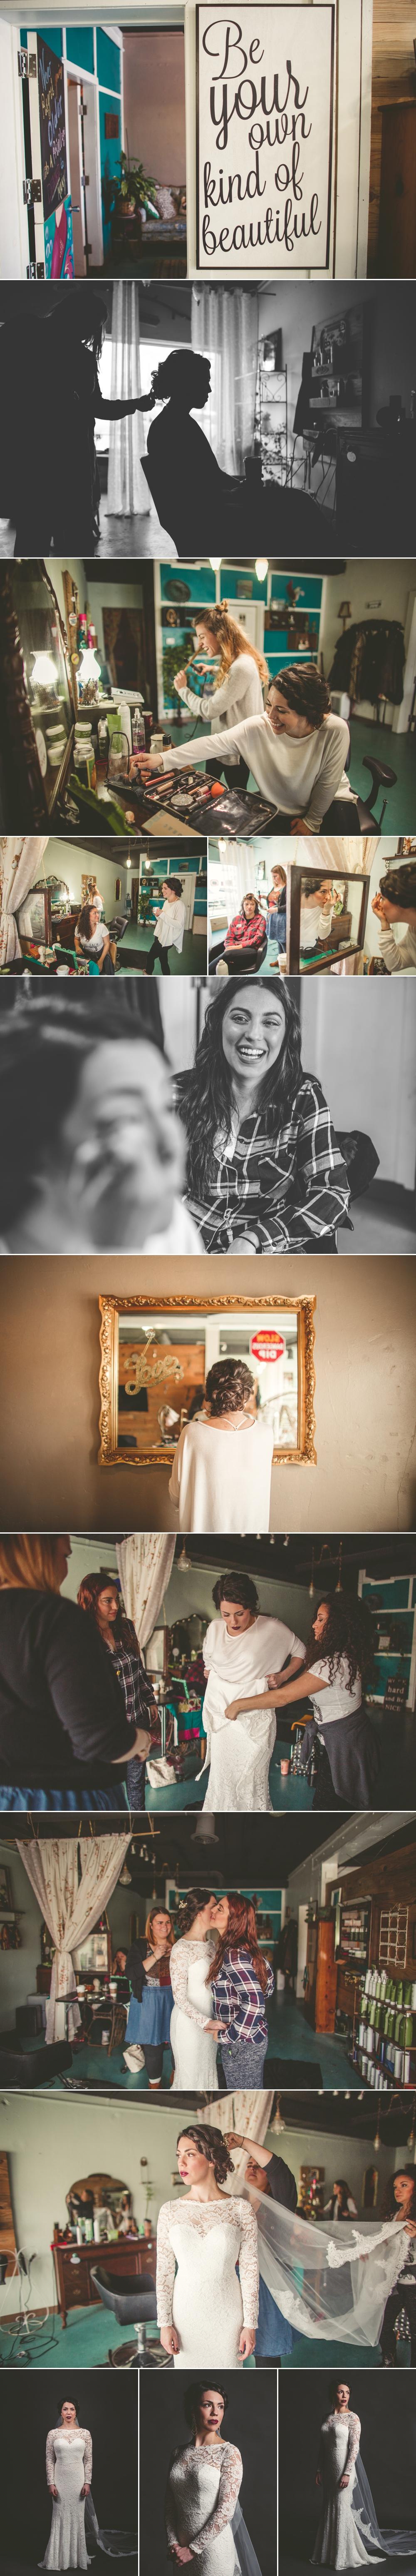 jason_domingues_photography_best_kansas_city_photographer_wedding_kc_weddings_james_p_davis_hall_0002.jpg